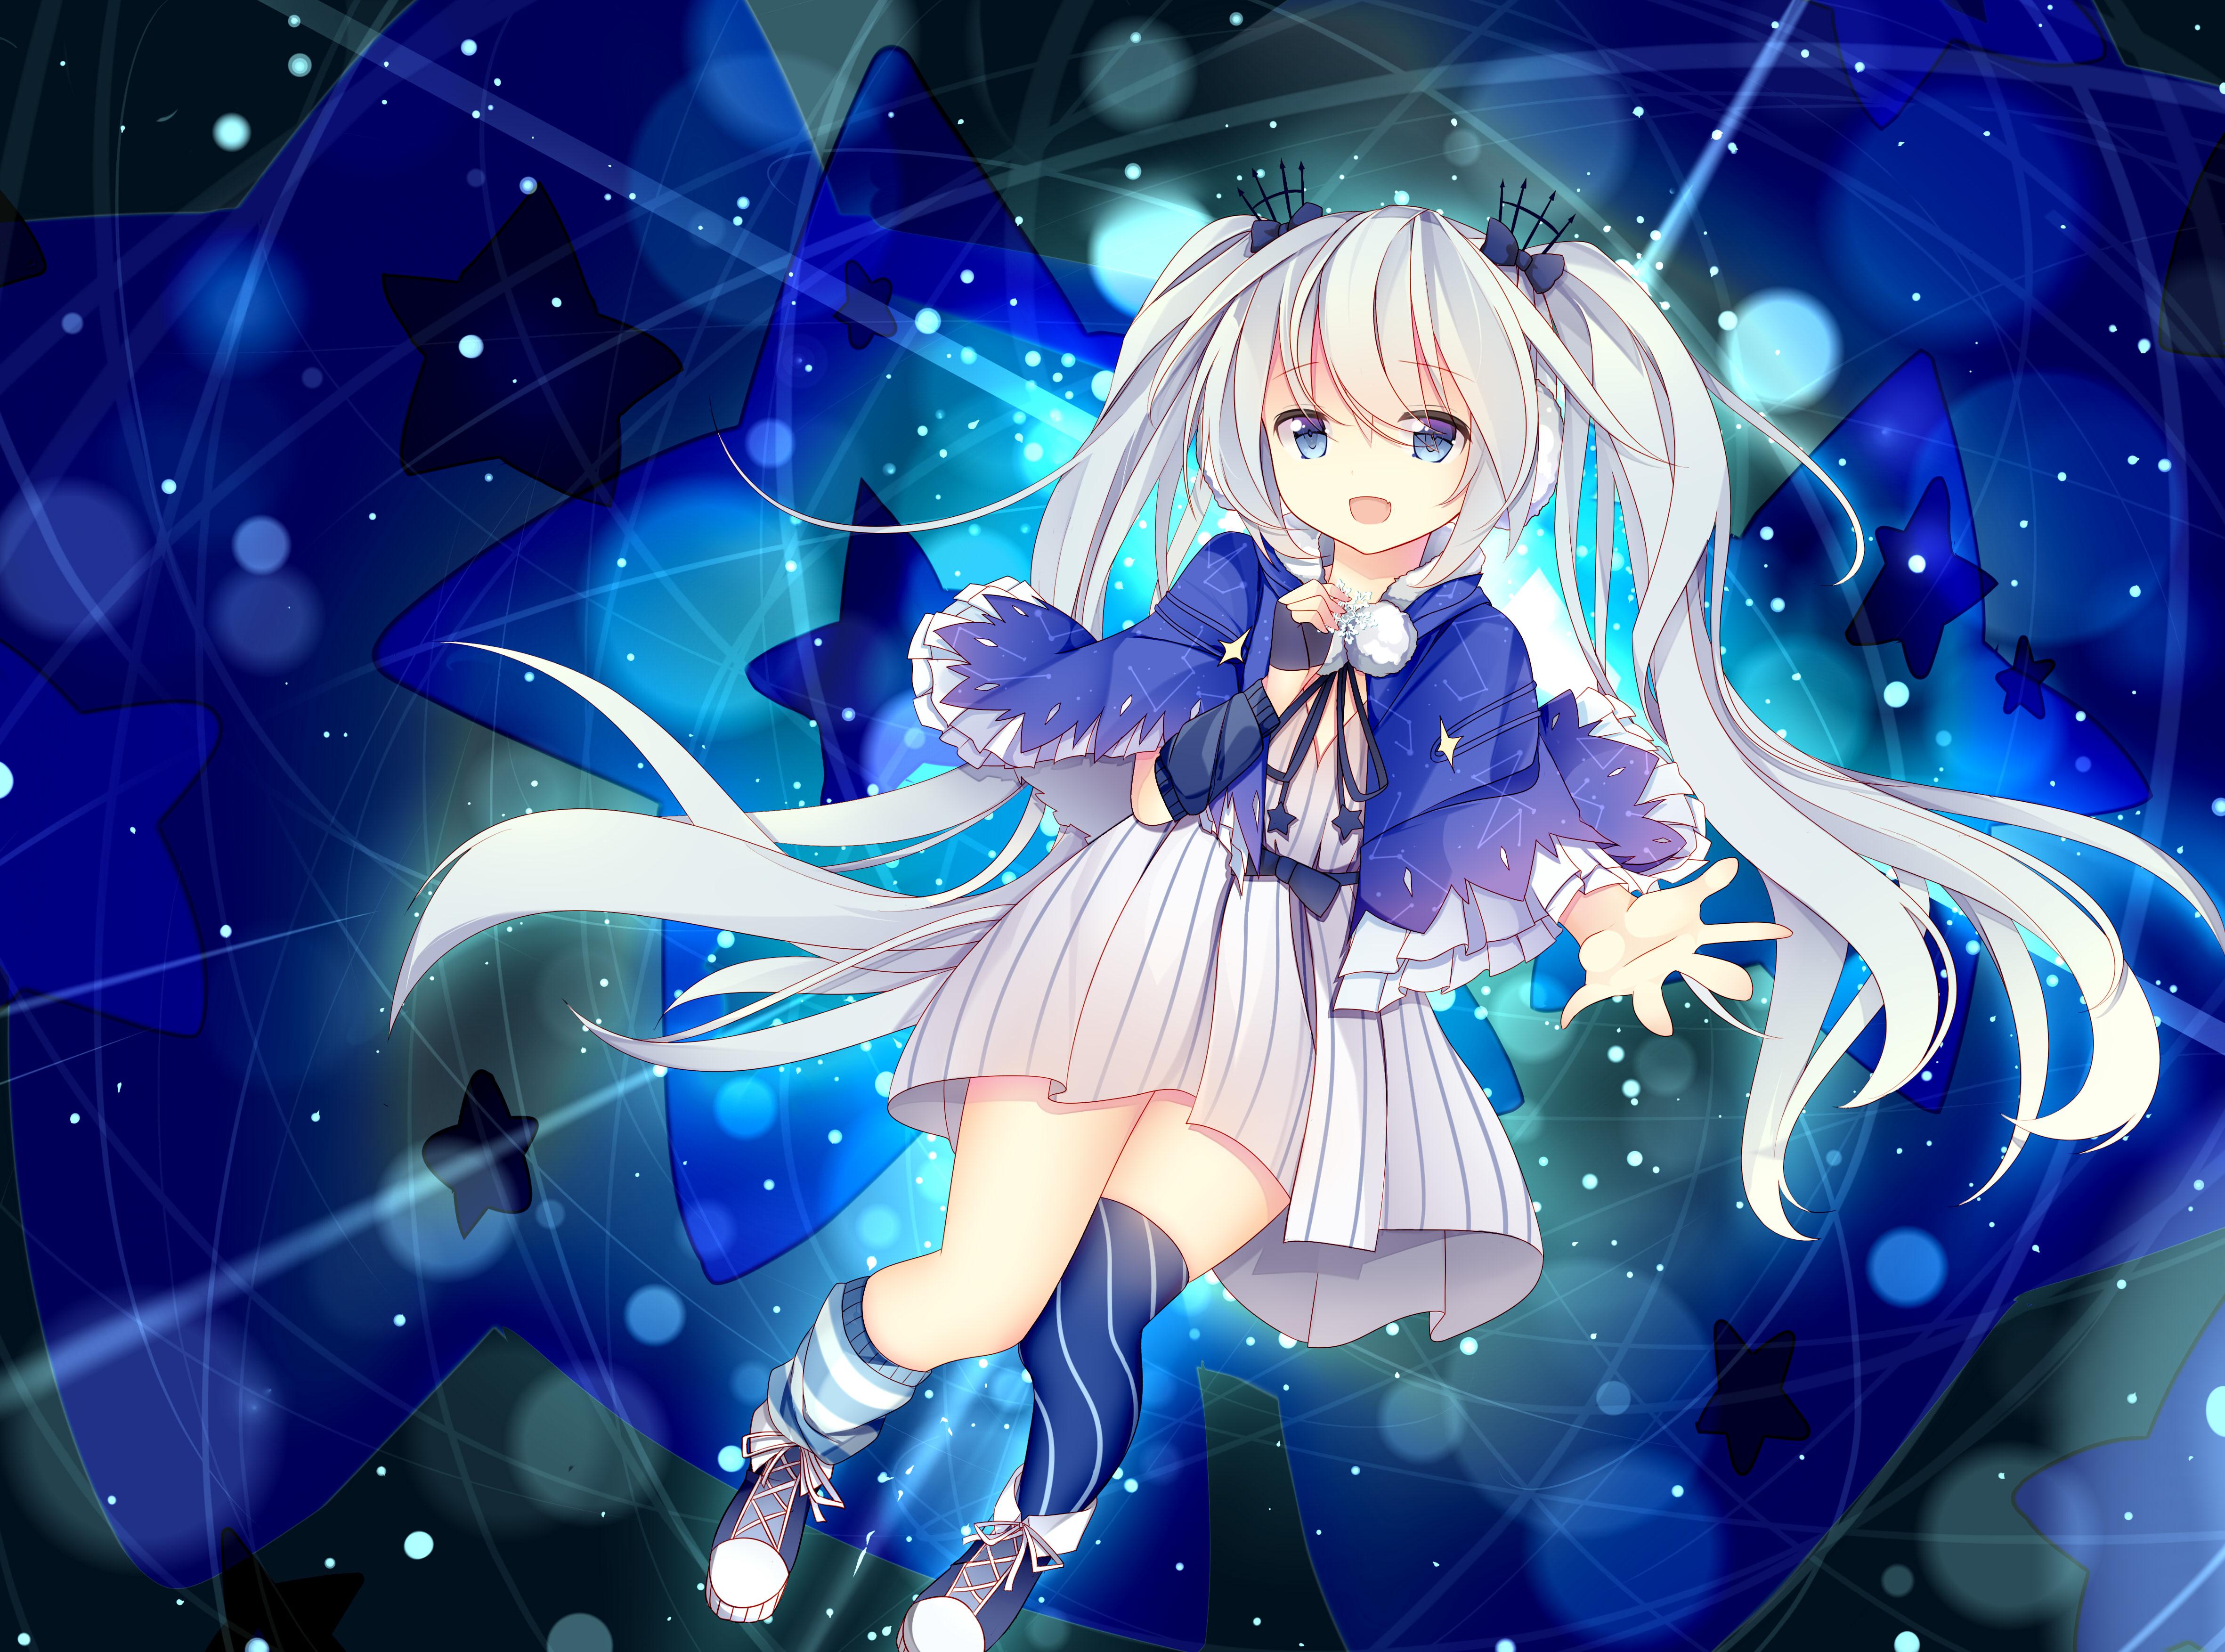 Anime 4724x3507 Vocaloid Hatsune Miku anime girls blue eyes long hair blue